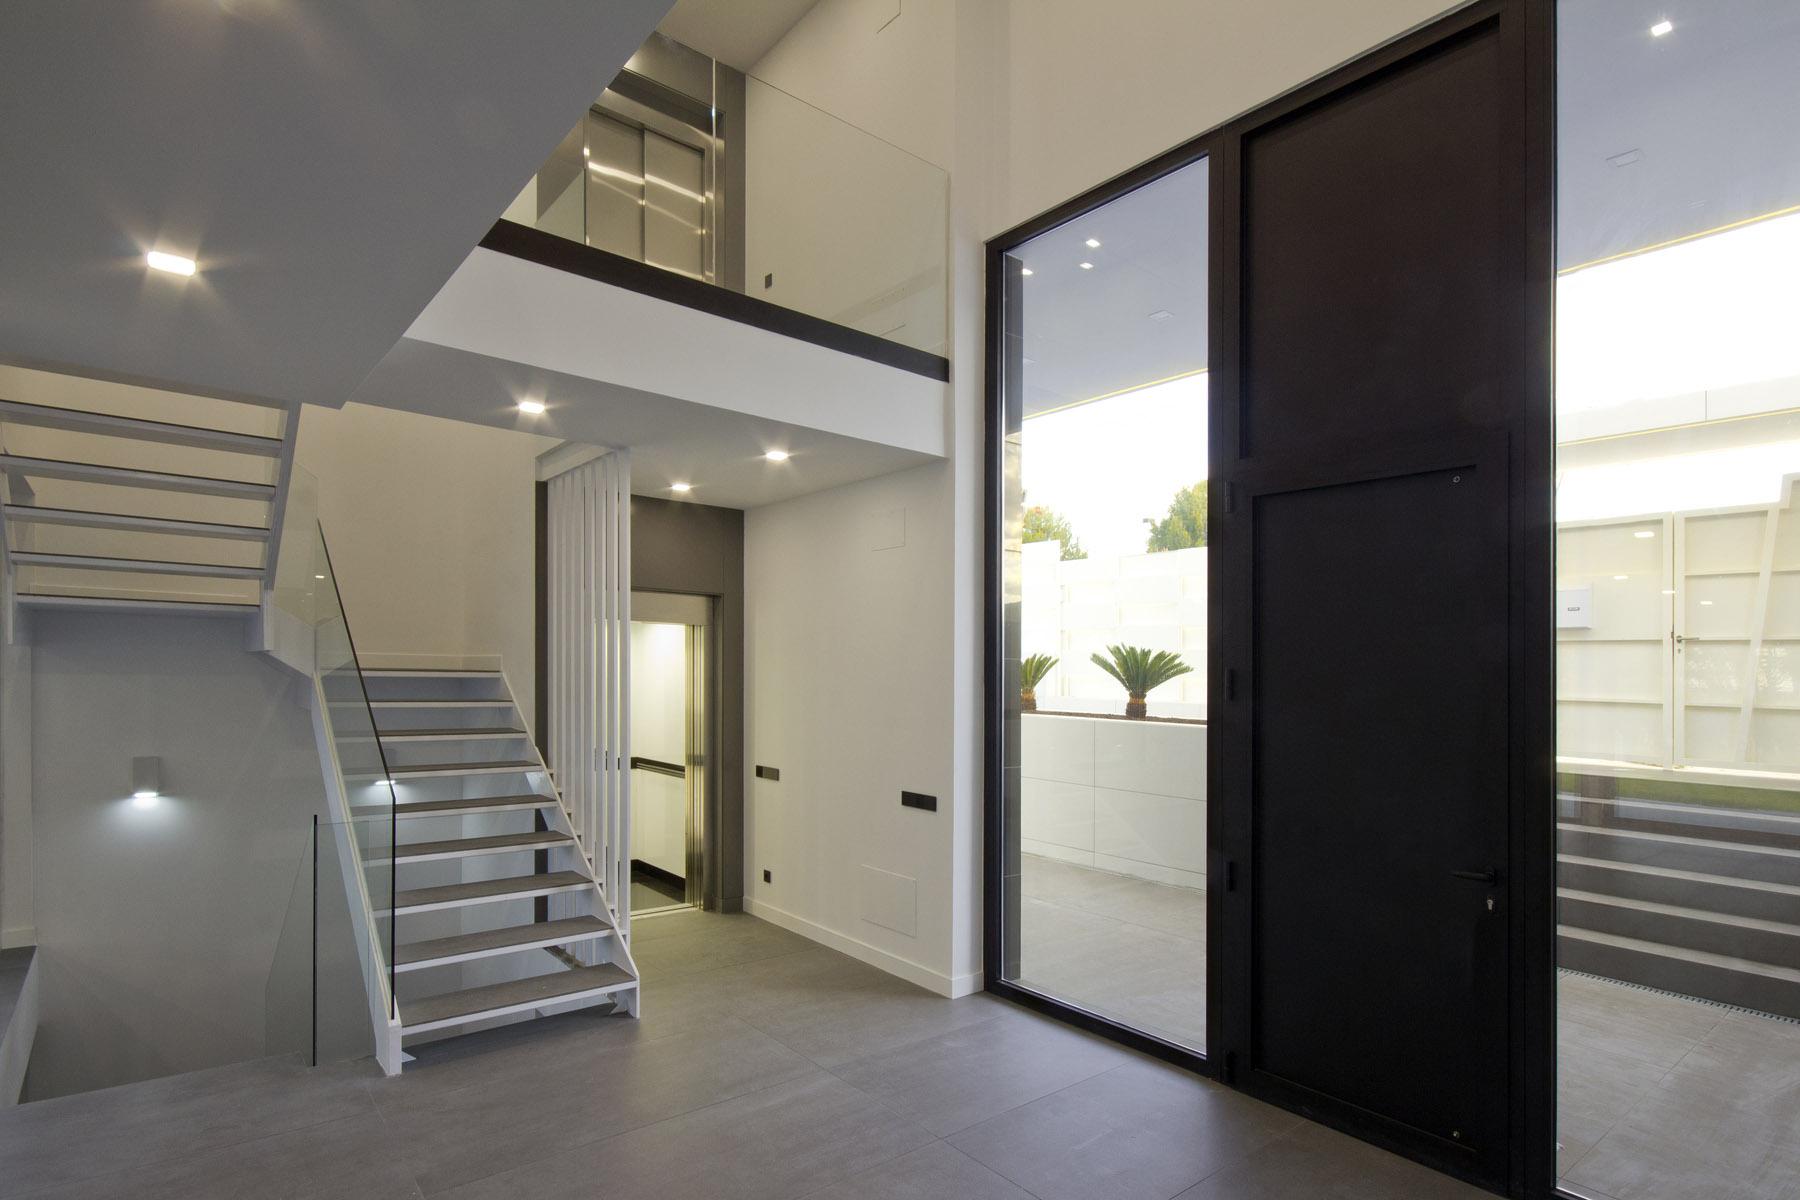 Vivienda-unifamiliar-aislada-en-la-plana-de-sitges-barcelona-19